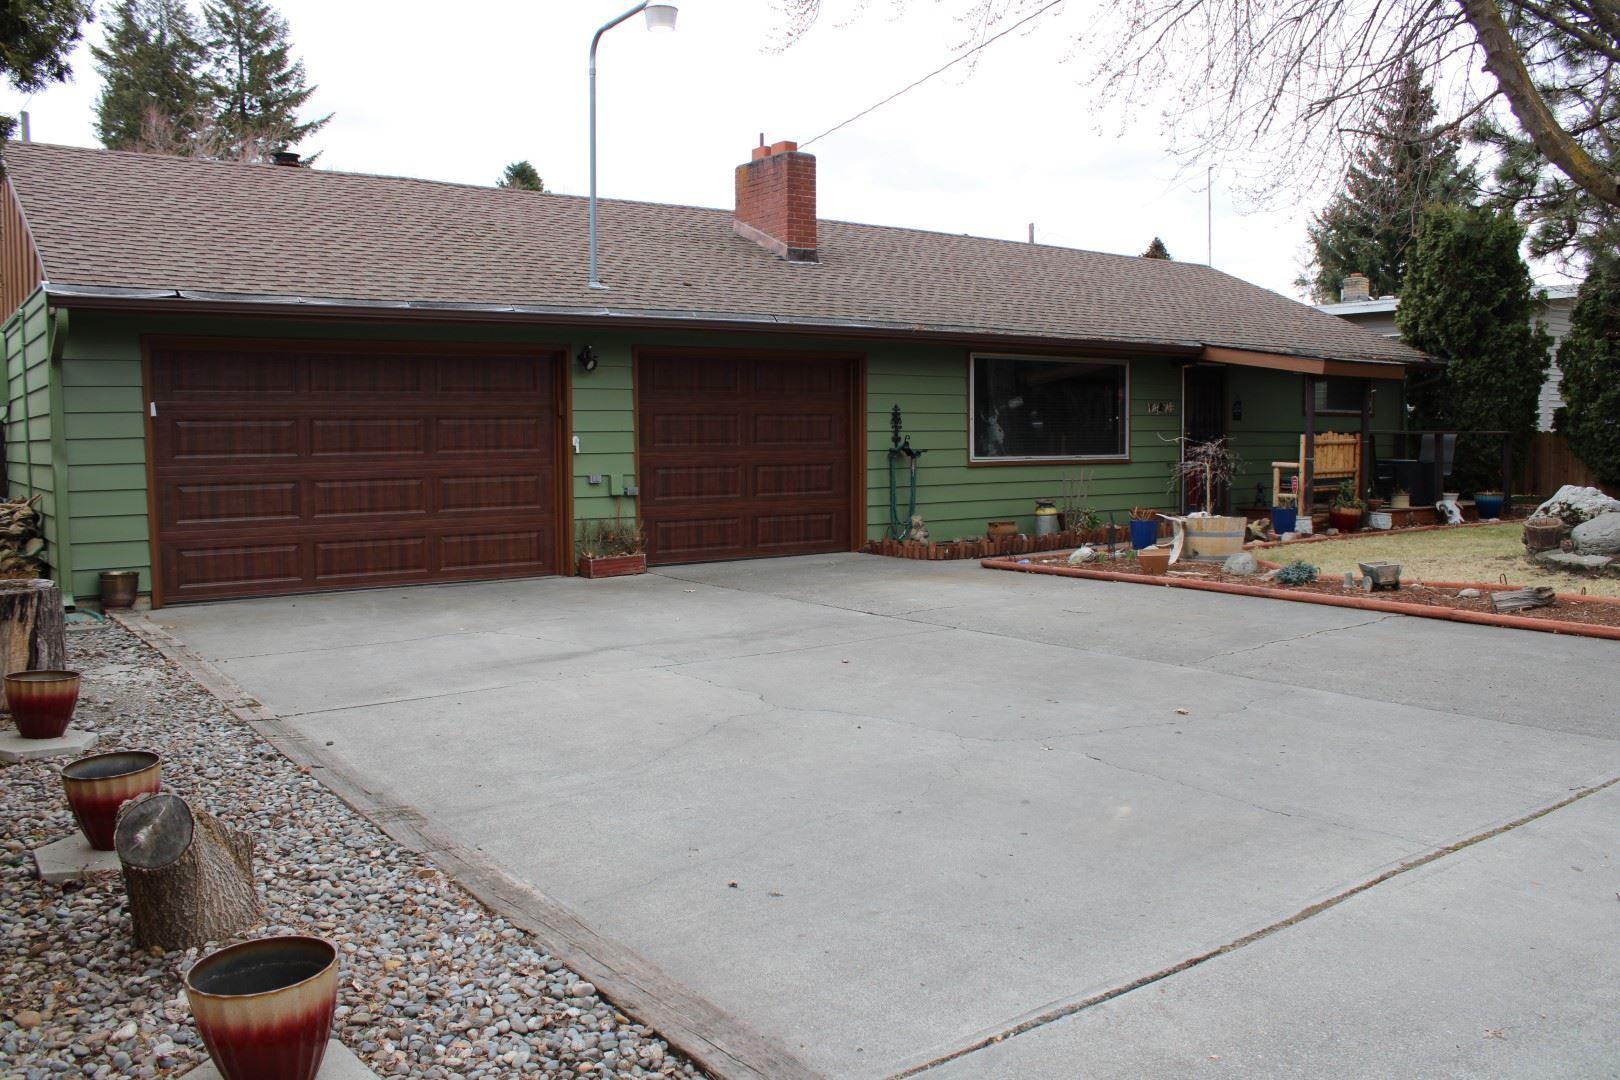 715 S Mamer Rd, Spokane, WA 99216 - #: 202112651